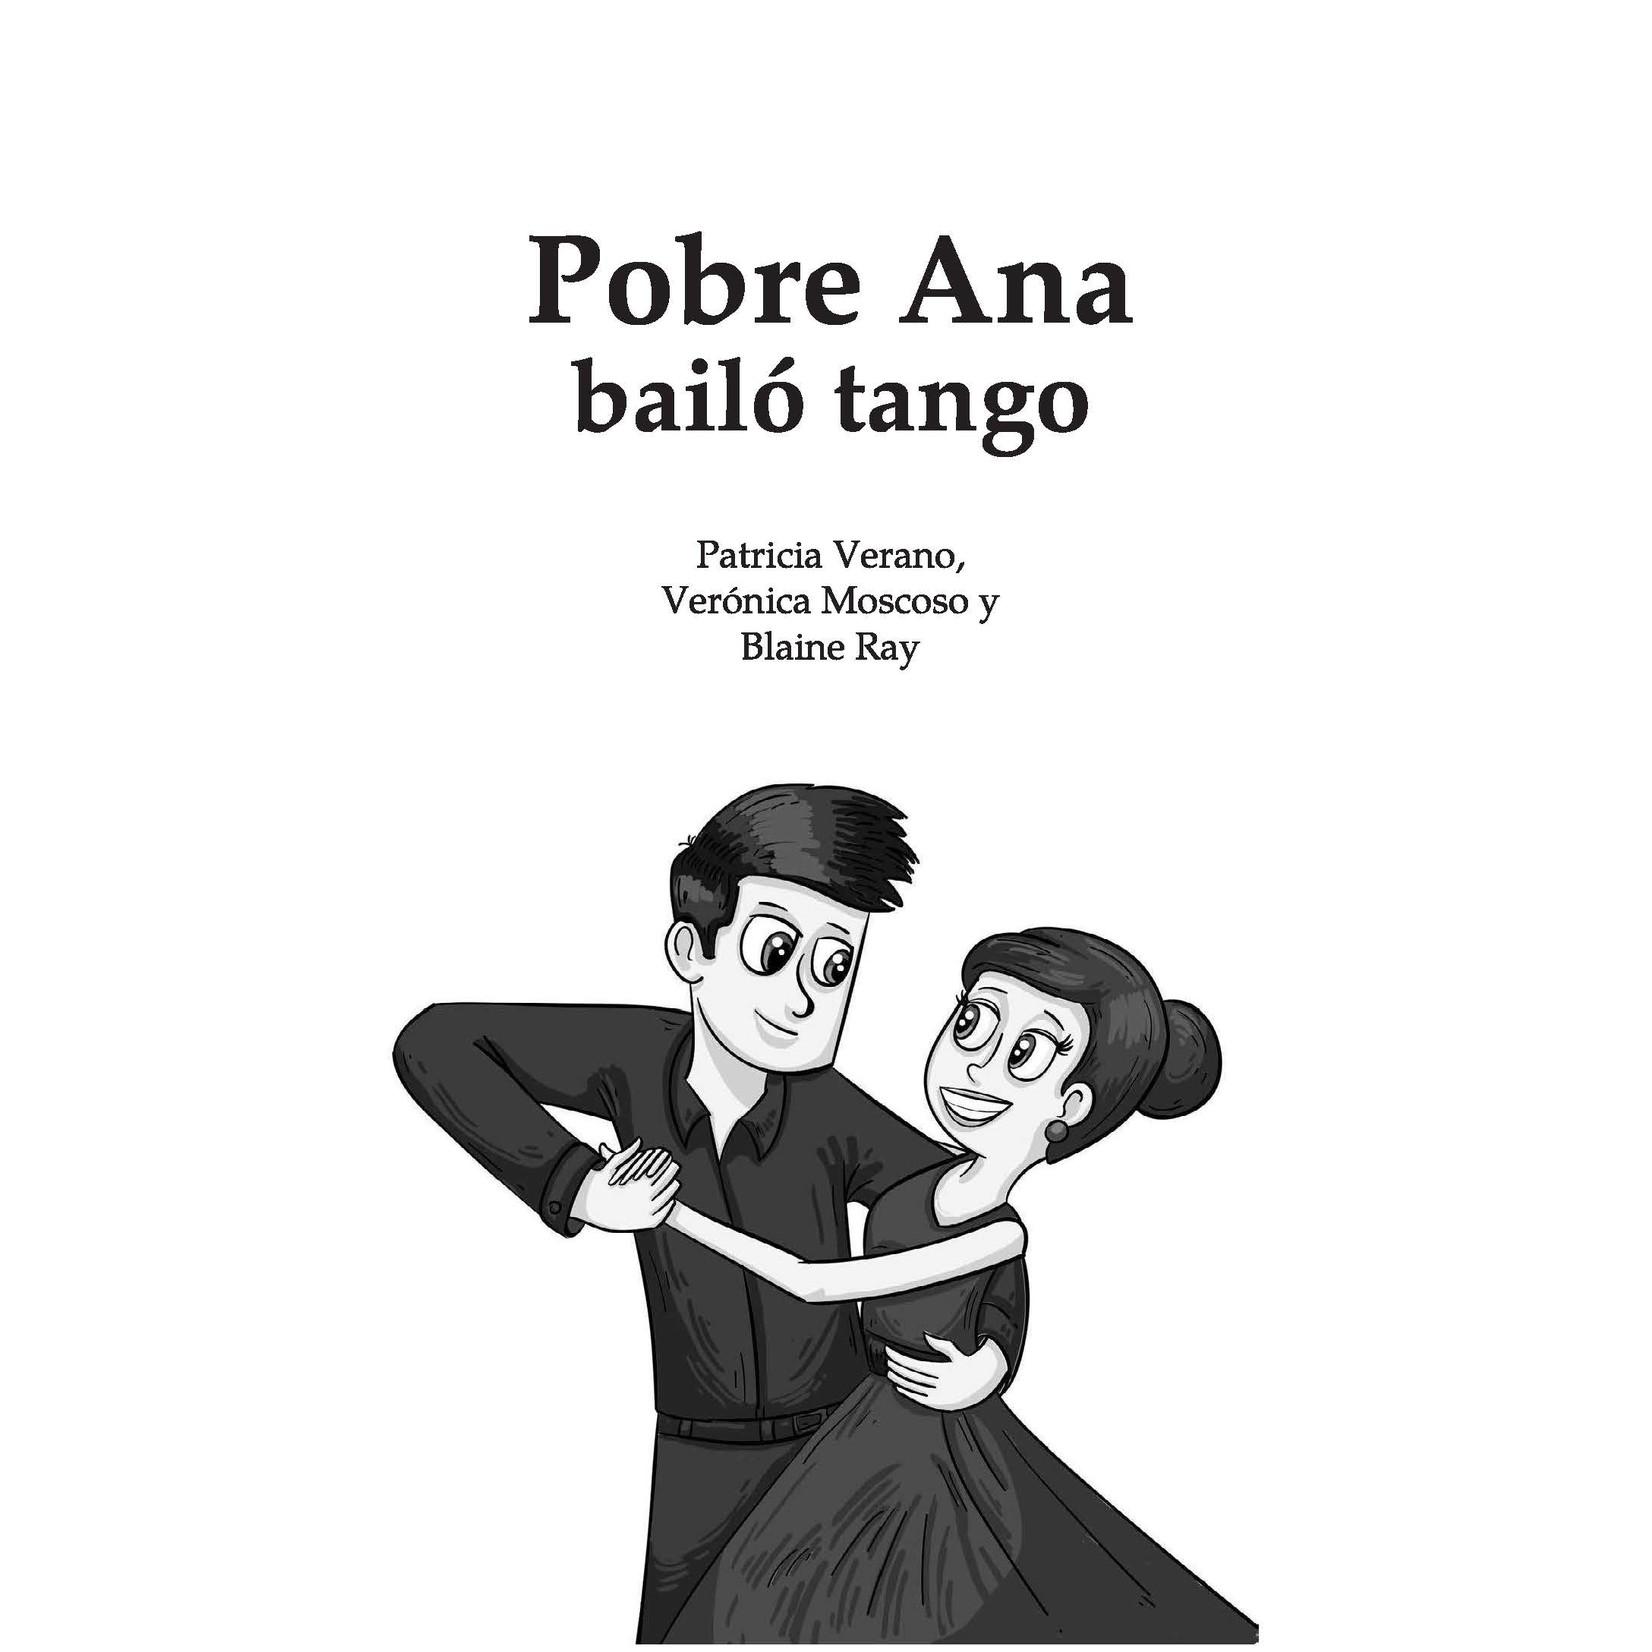 TPRS Books Pobre Ana bailó tango